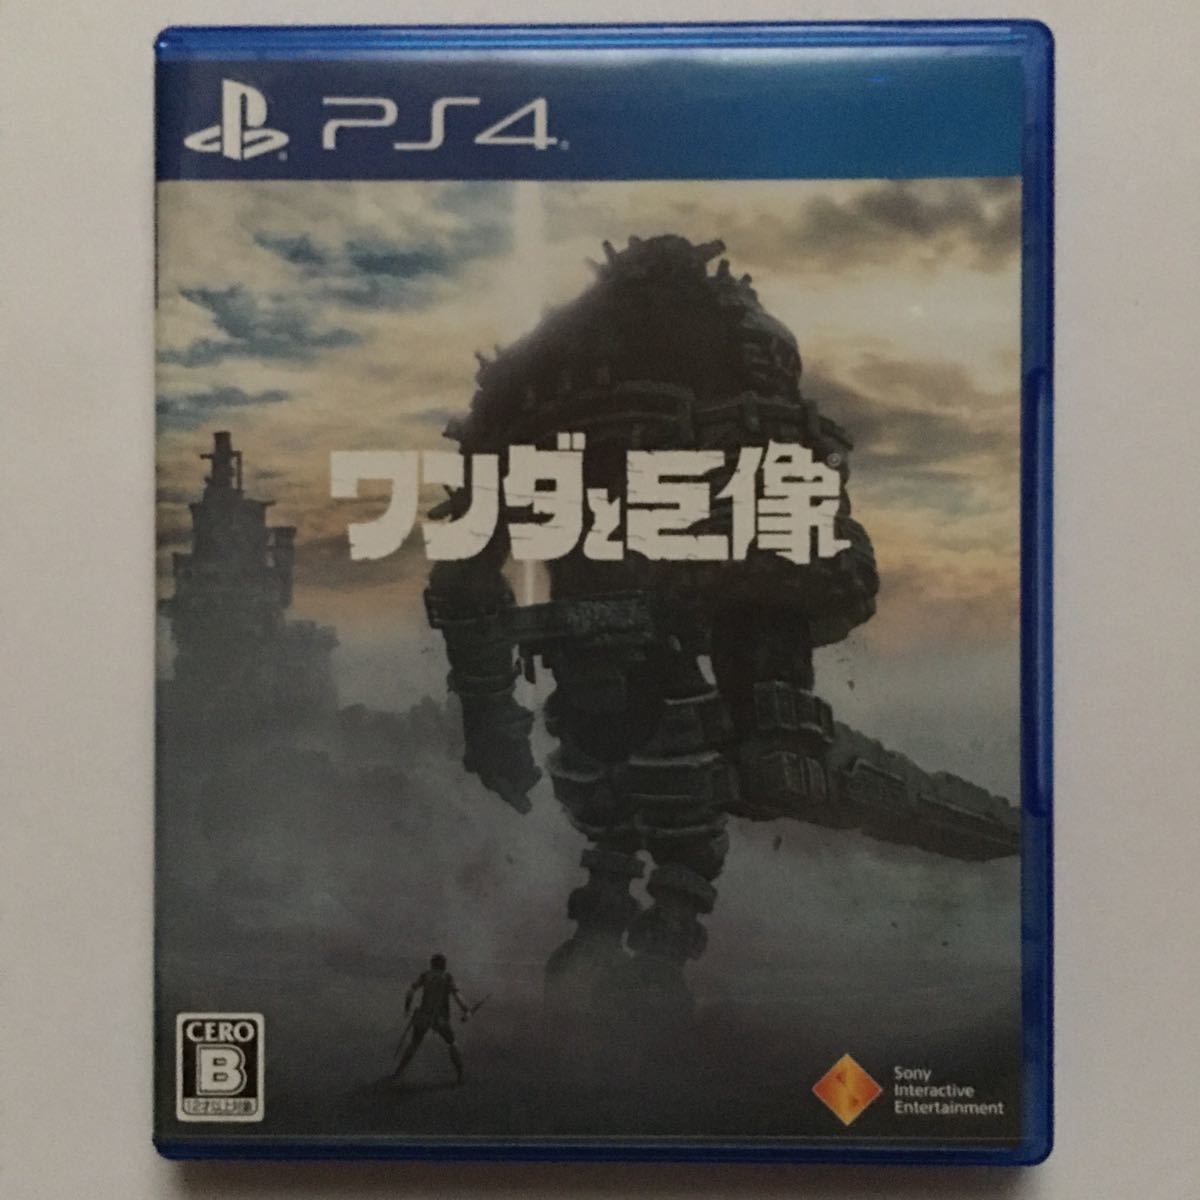 【PS4】 ワンダと巨像 [通常版]